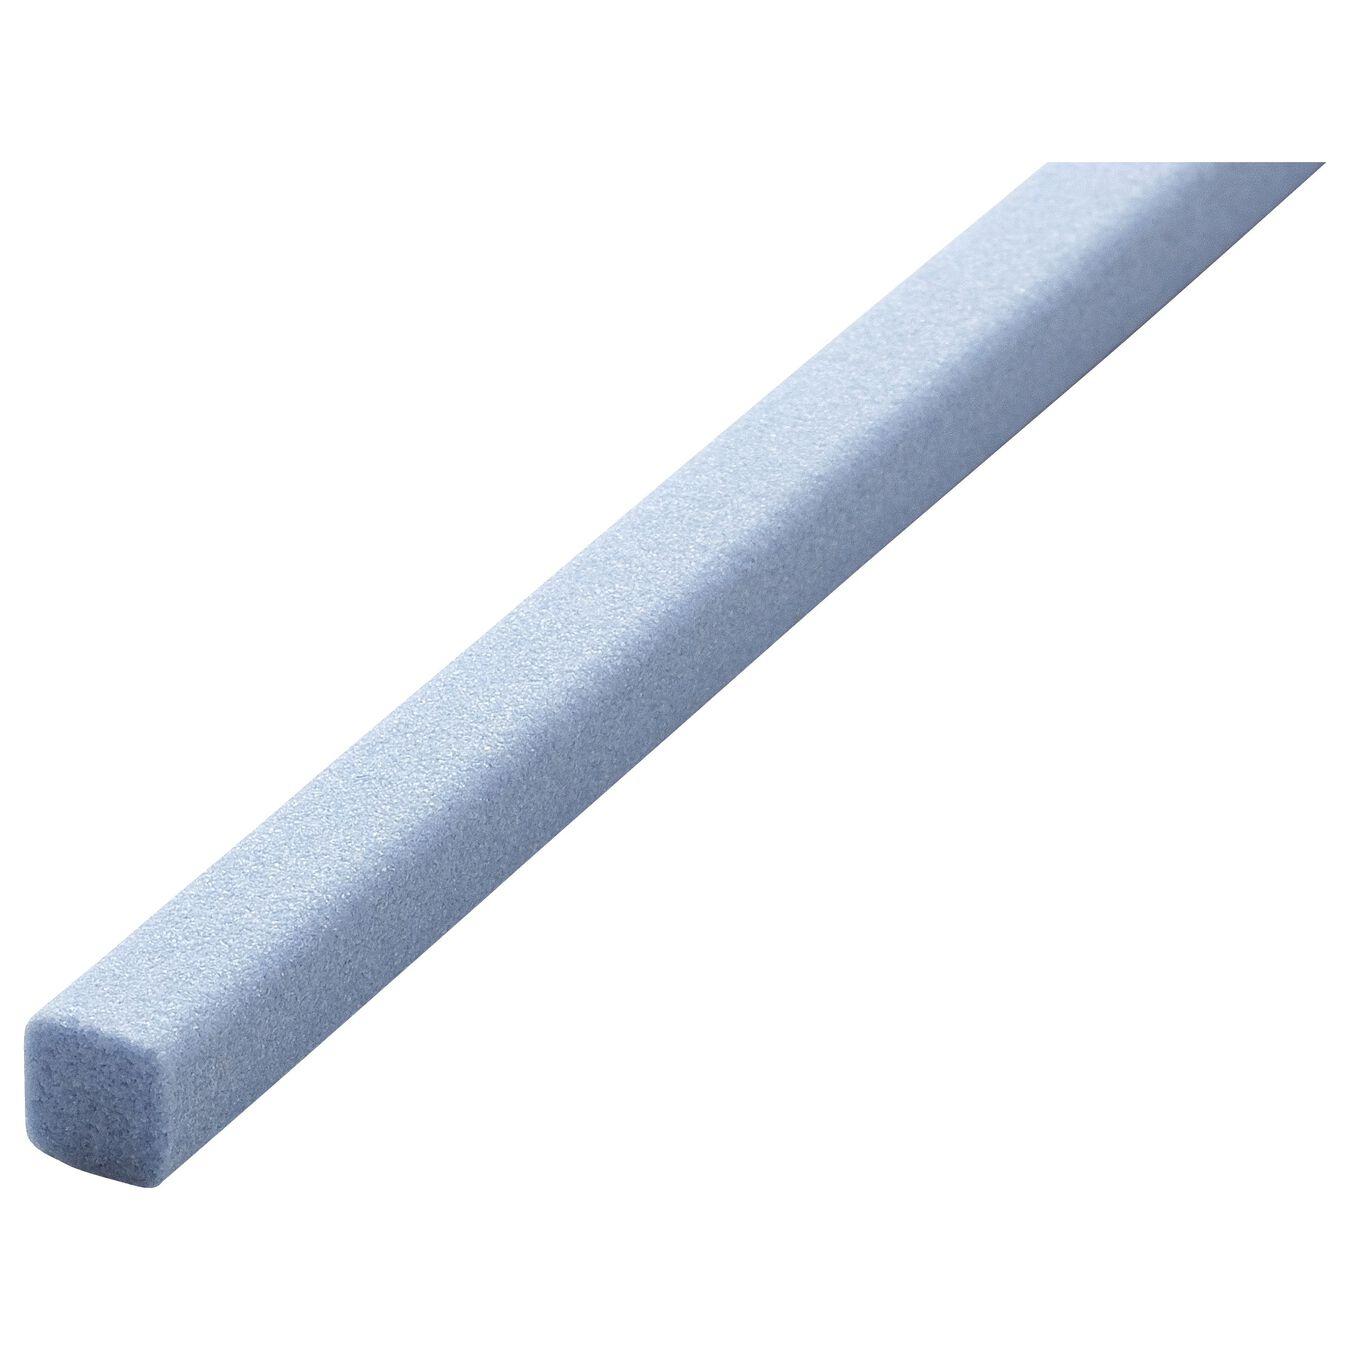 Tige d'affûtage 2 cm,,large 2